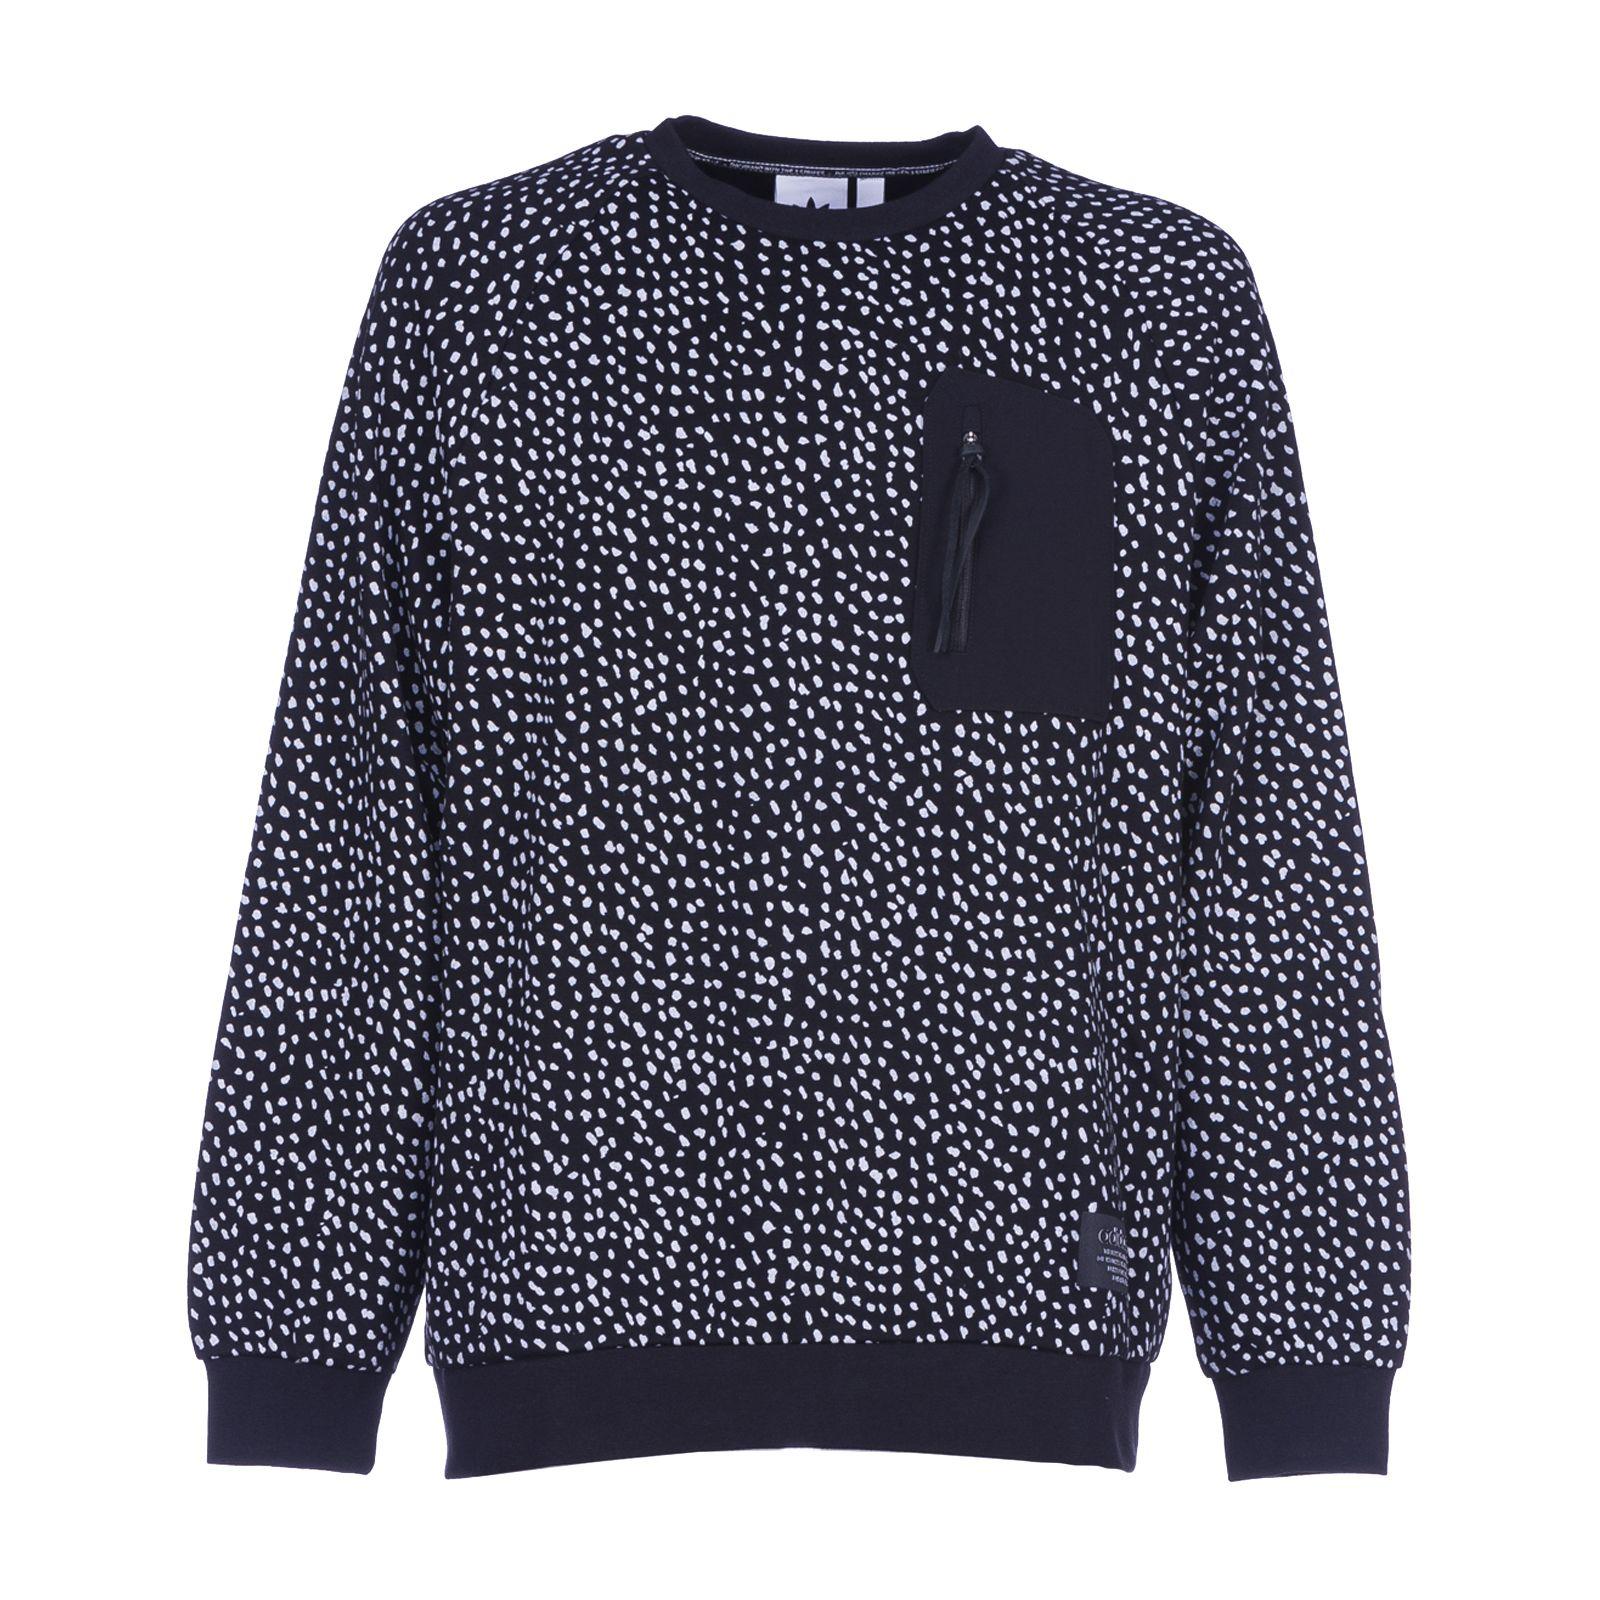 Adidas Originals Raindrop Print Sweatshirt